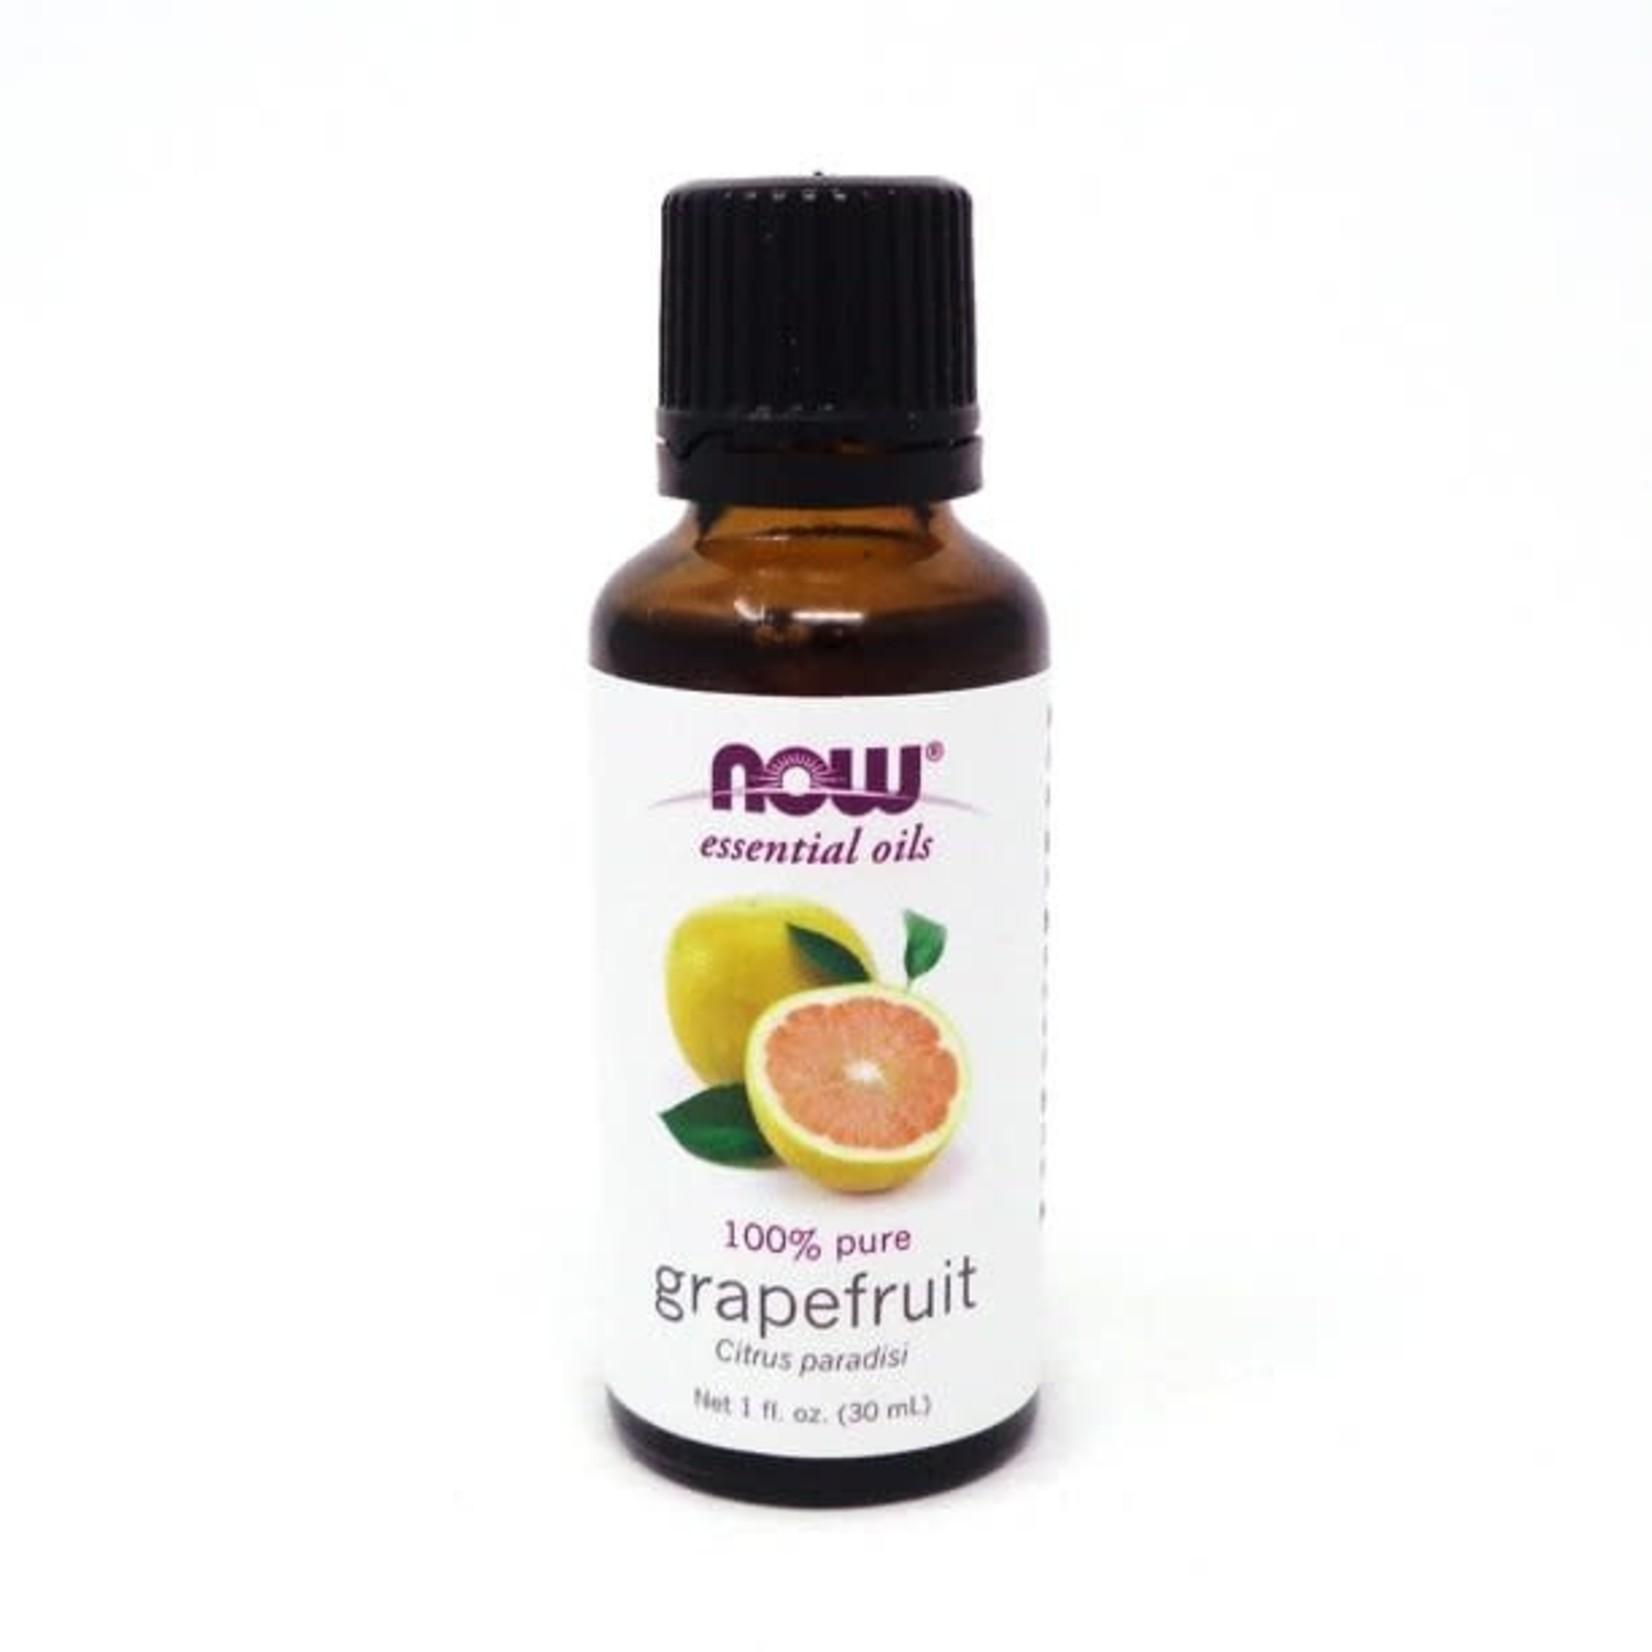 Now Now Grapefruit Essential Oil 30ml